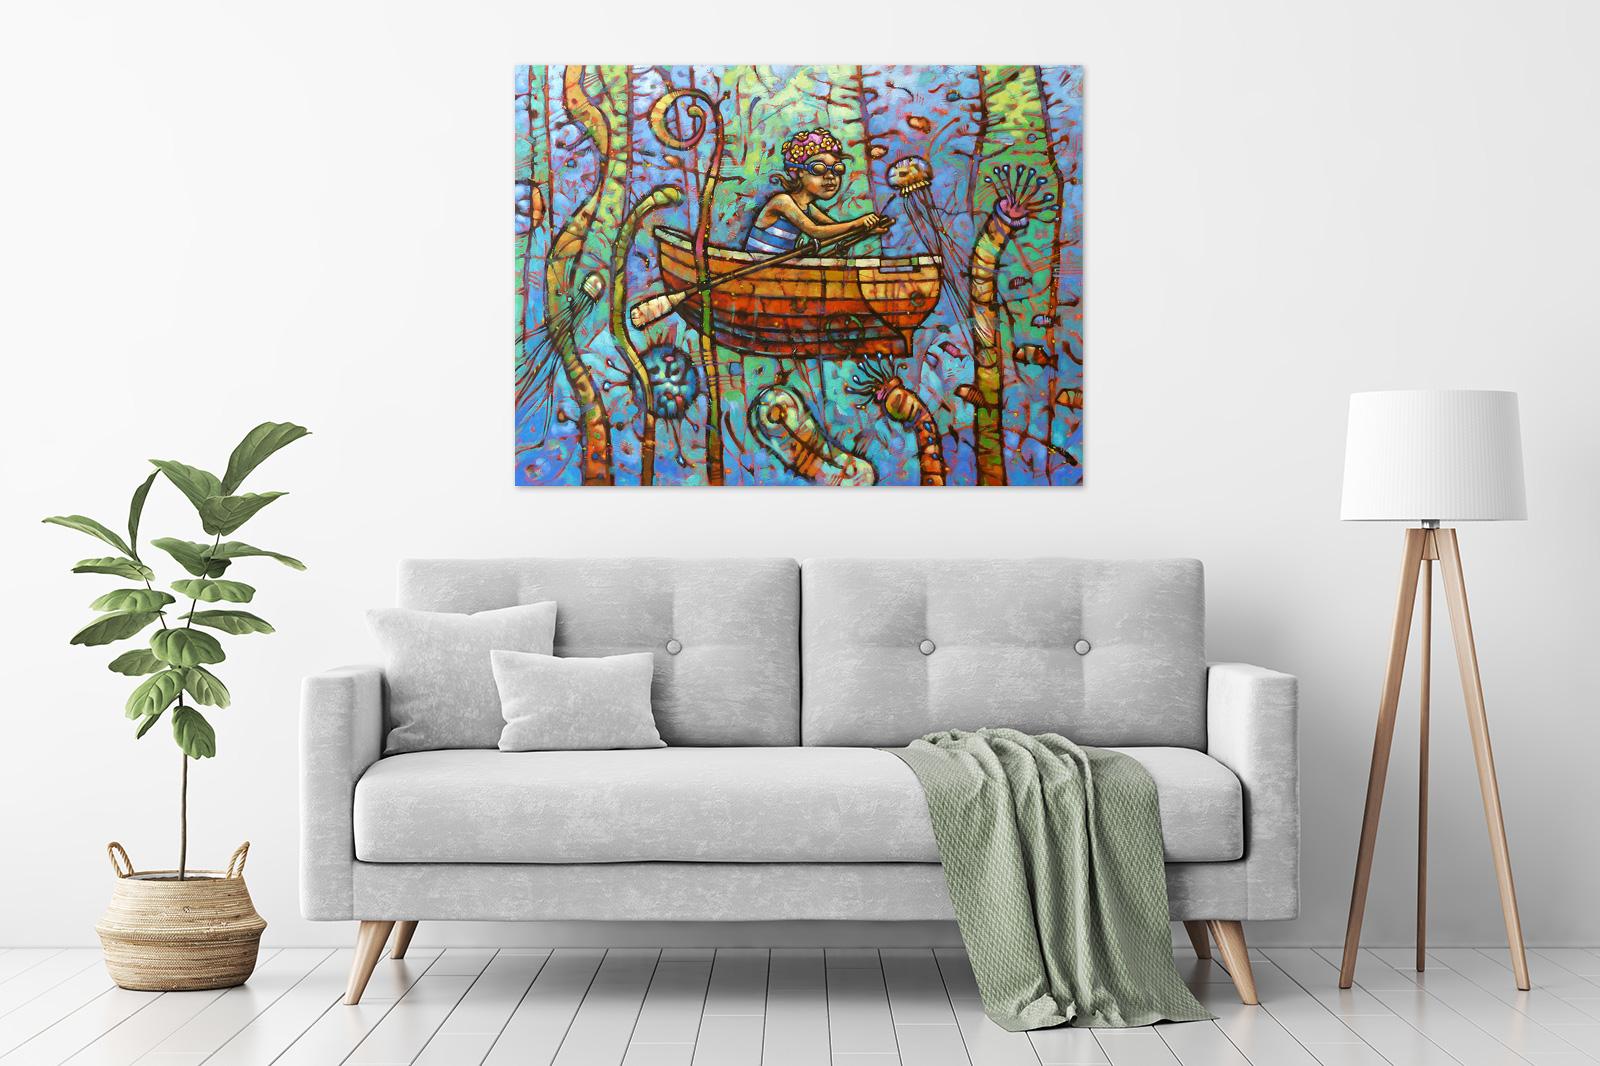 Malcolm Lindsay - 'Sub-Marine Dream' in a room